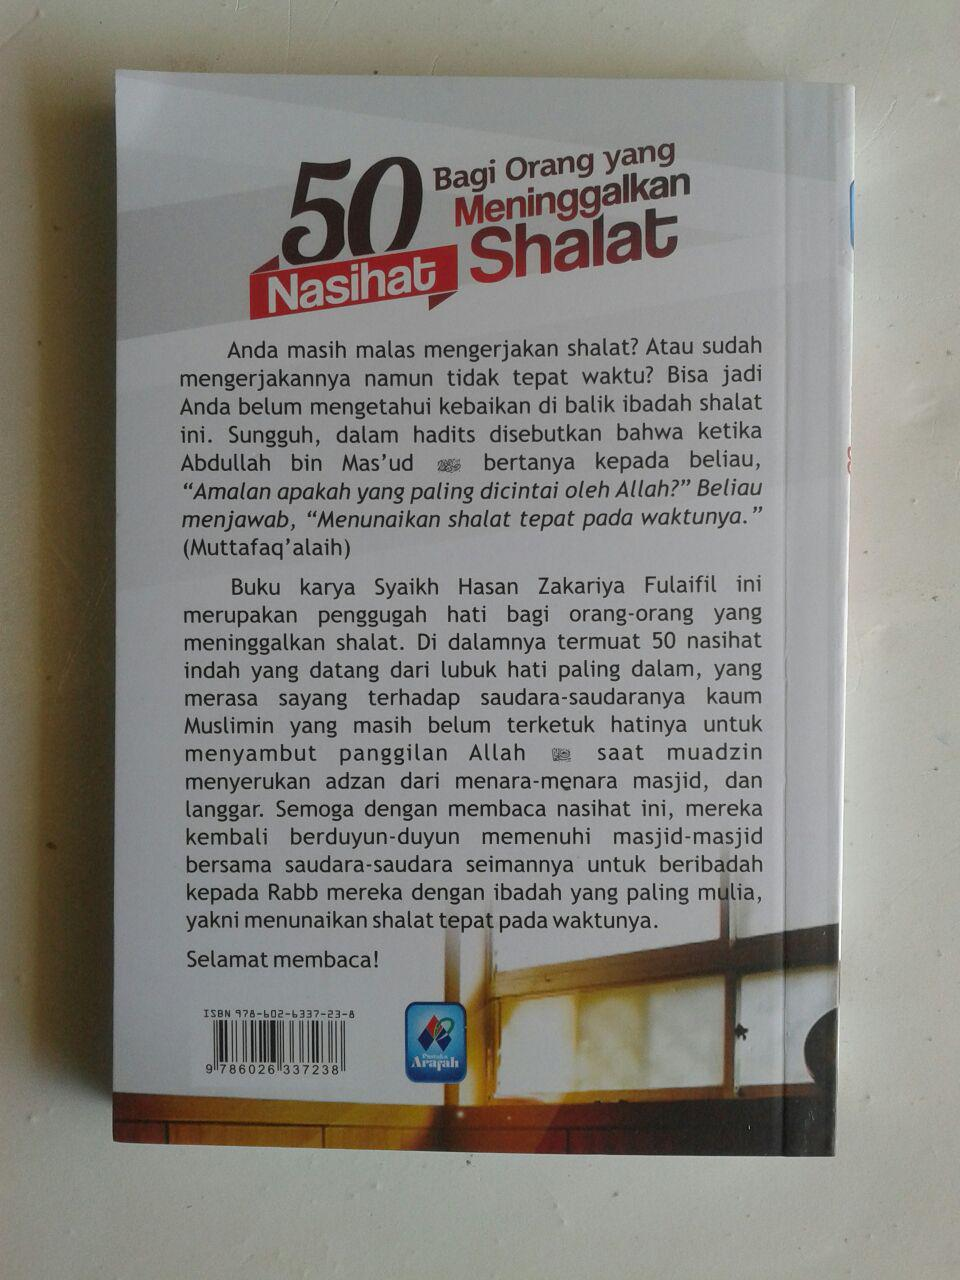 Buku Saku 50 Nasihat Bagi Orang Yang Meninggalkan Shalat cover